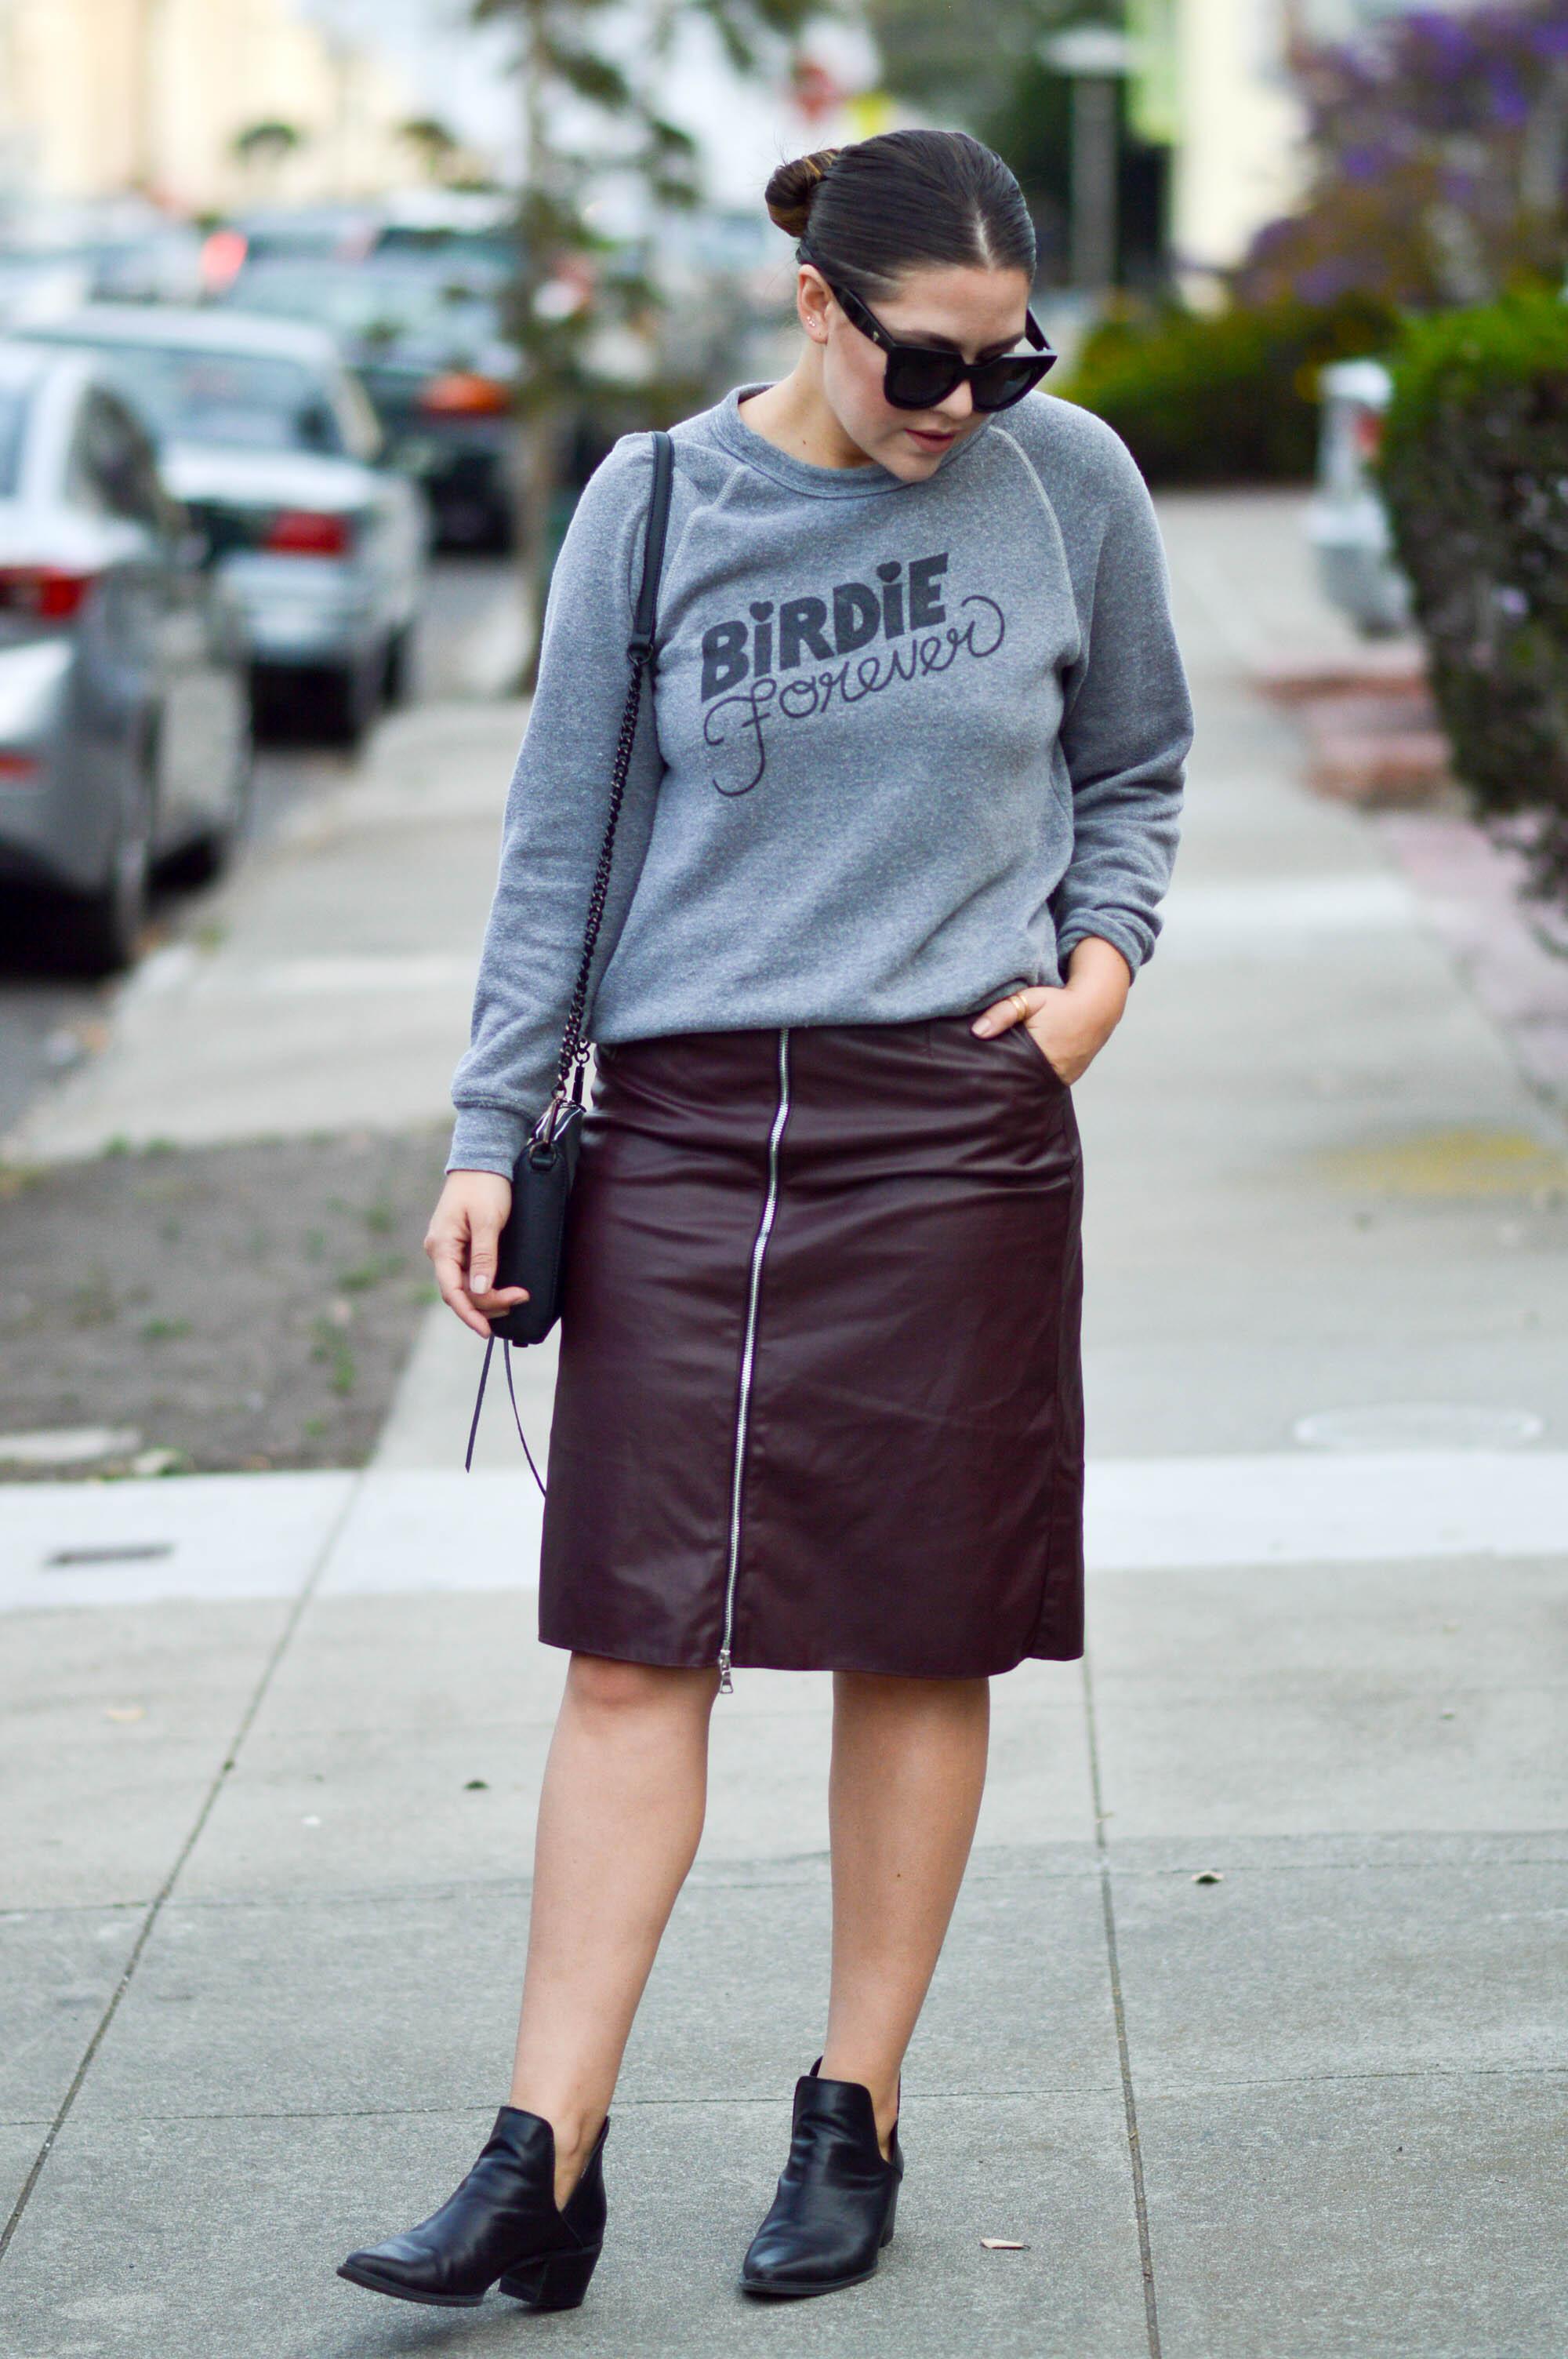 Suddenly in September, San Francisco Fashion blogger via. www.birdieshoots.com